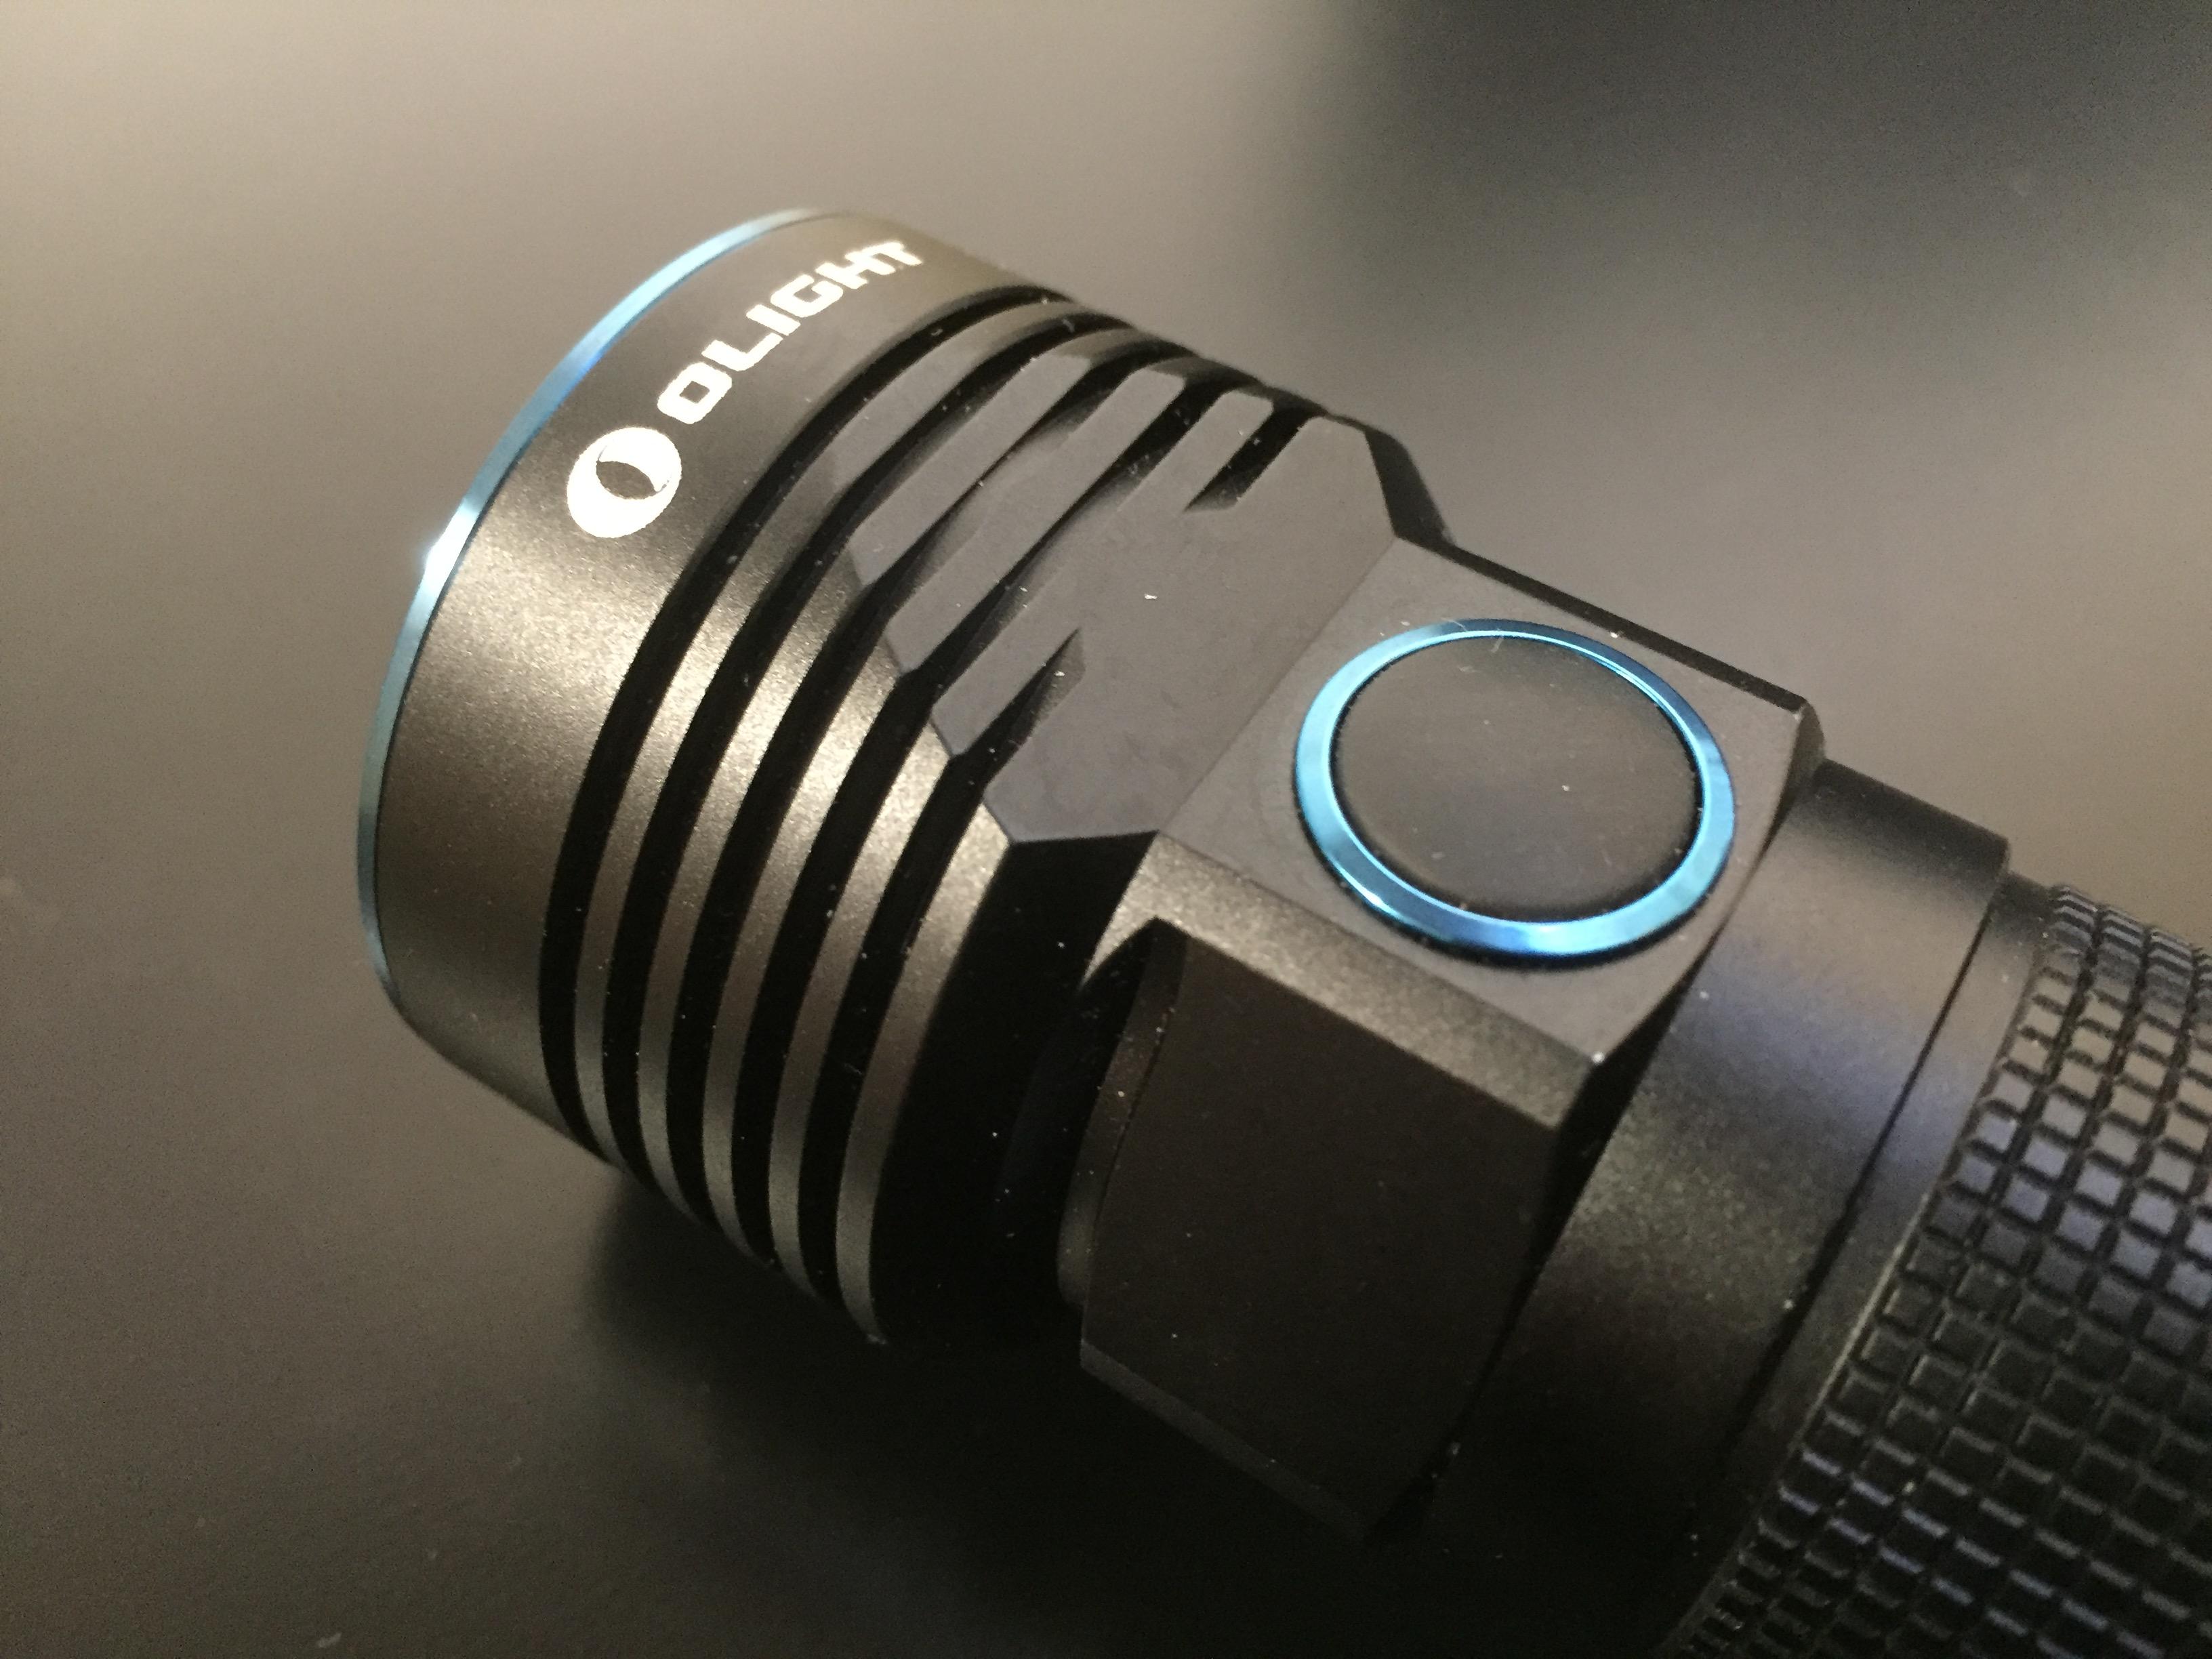 I got my OLight R50 Pro Seeker-img_2268.jpg